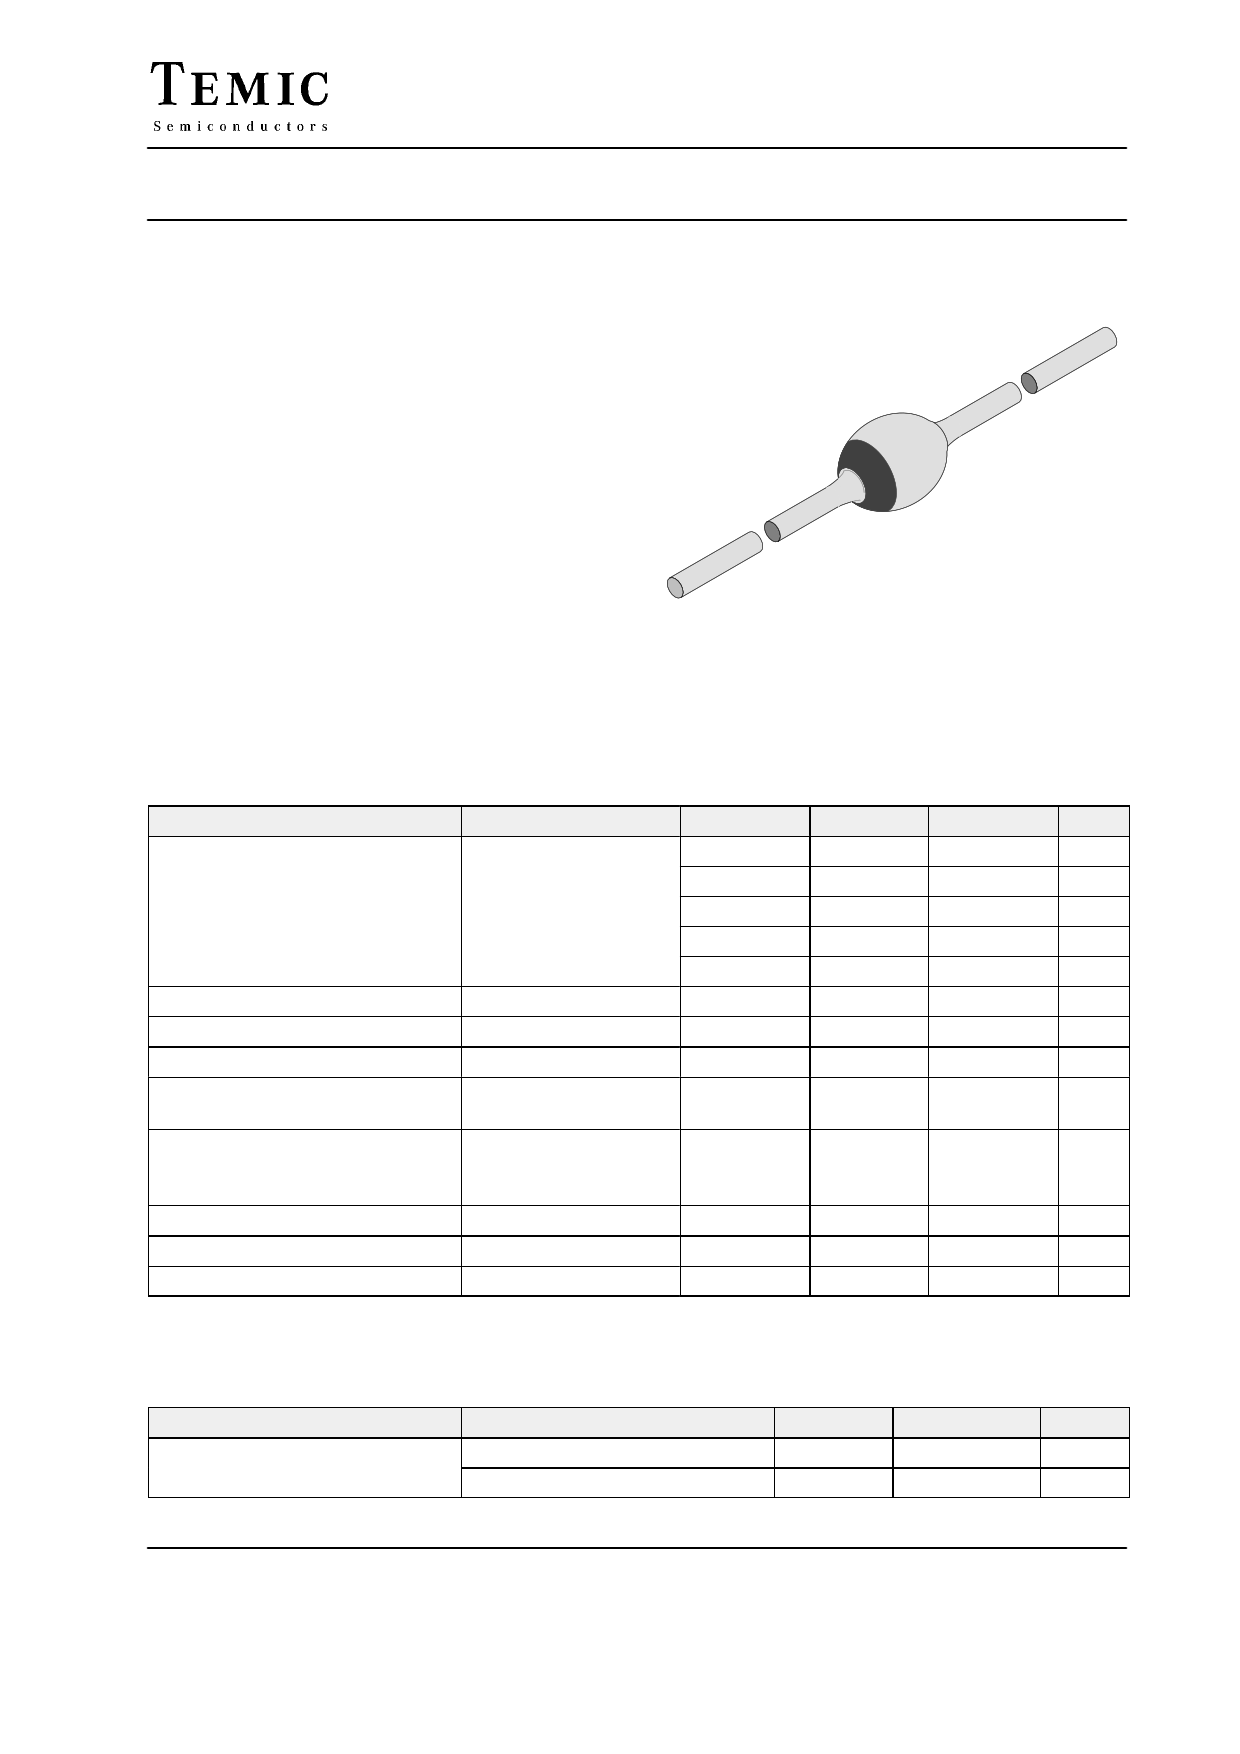 1n5062 datasheet